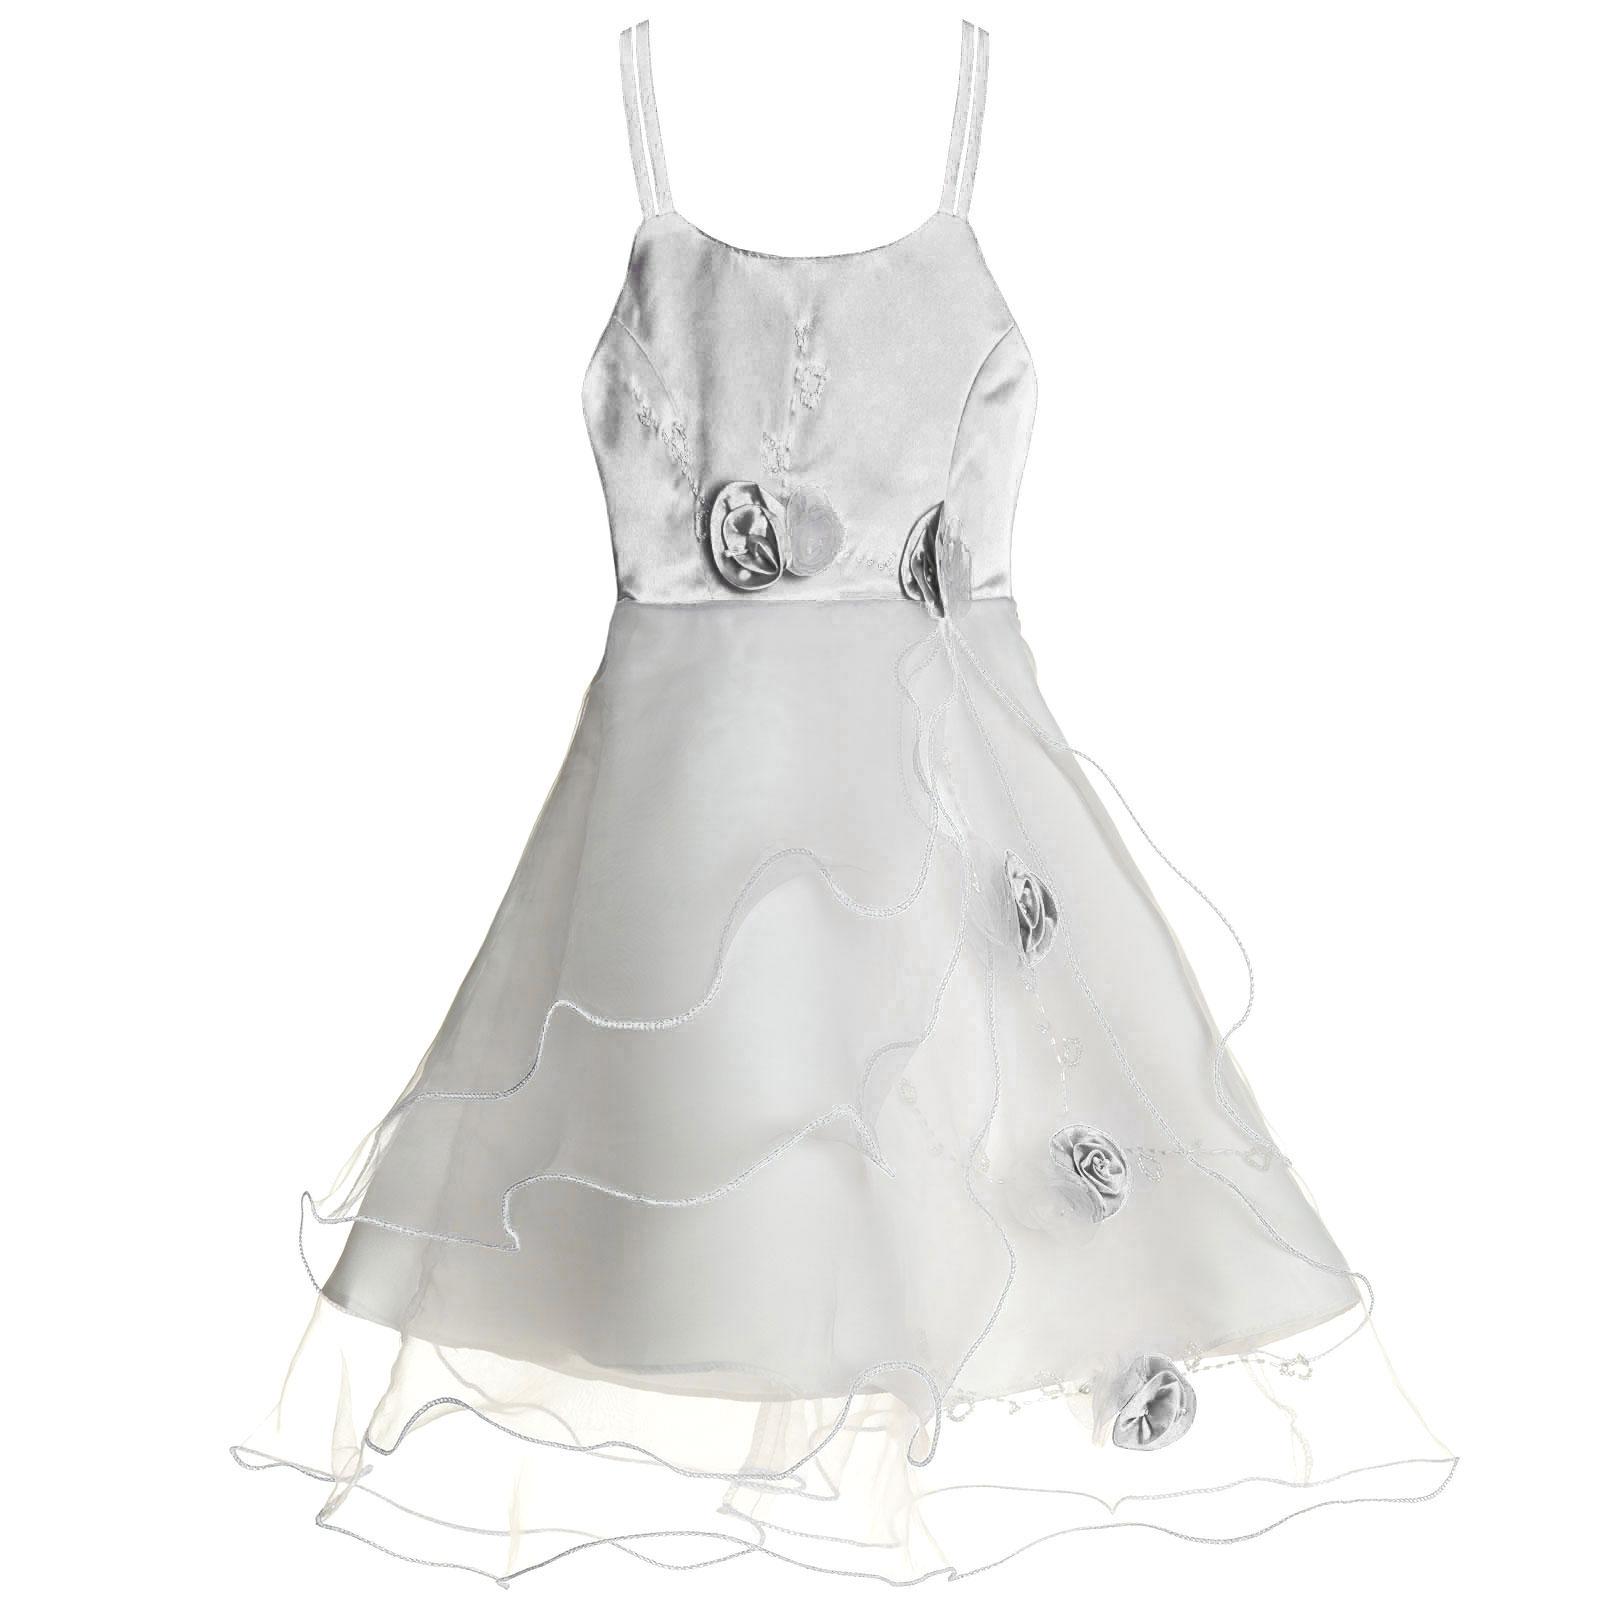 Maedchen-Kinder-Kleid-Peticoat-Festkleid-Lang-Arm-Kostuem-mit-Bolero-Rose-21476 Indexbild 24